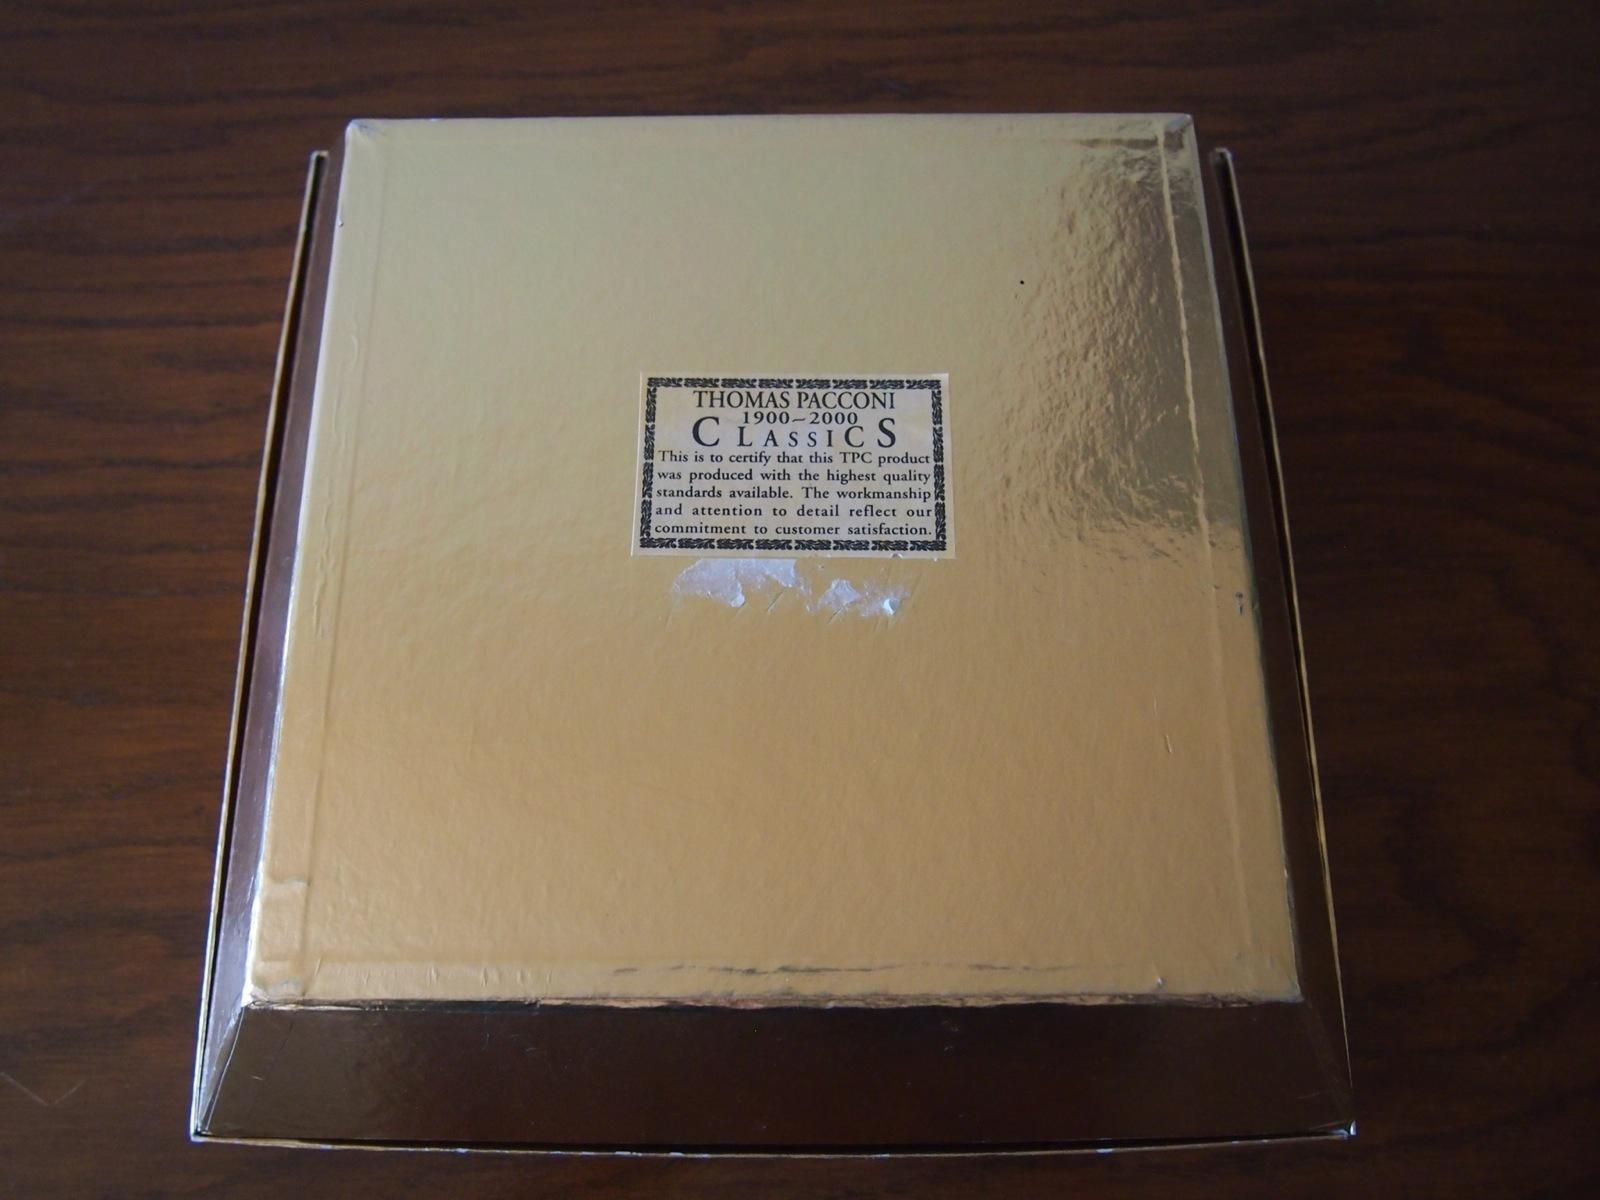 Thomas Pacconi Museum Classics Glass Candy Ornament Set Box 2000 Collection Lot